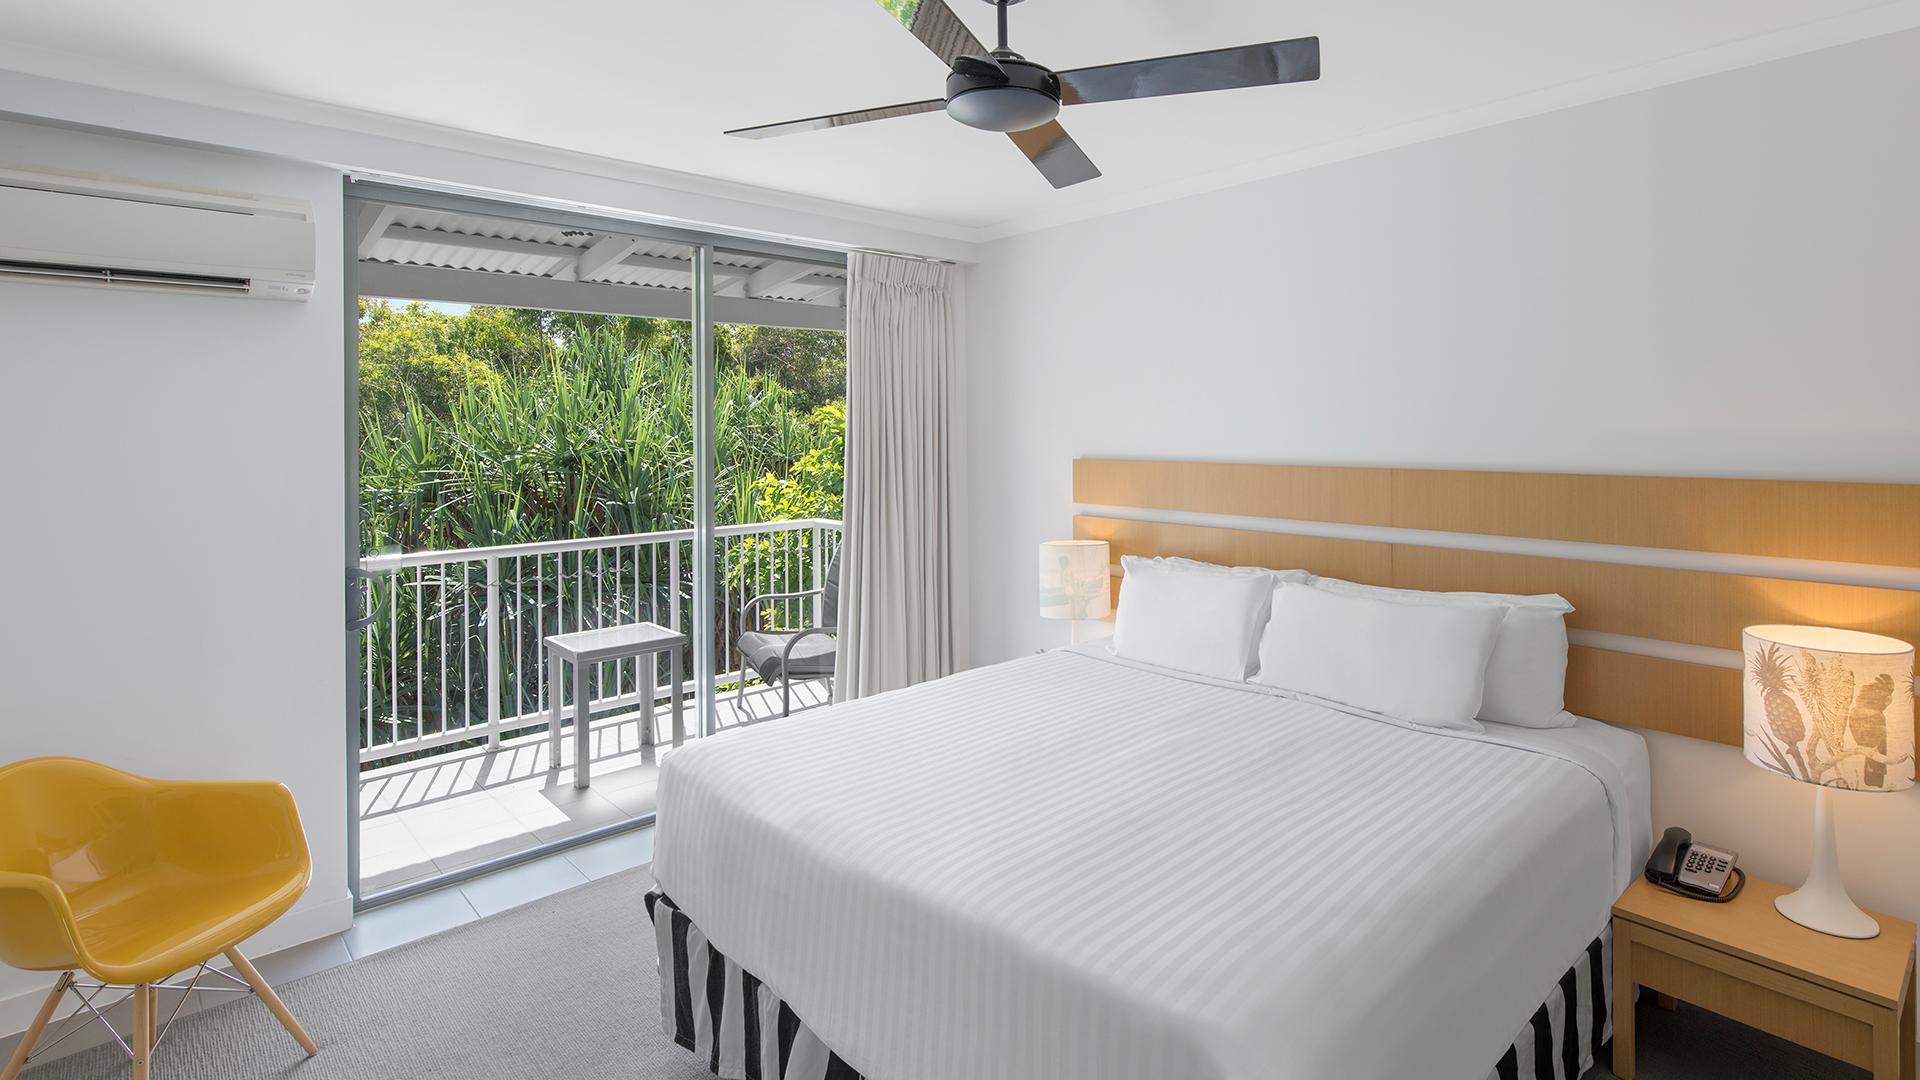 Hotel Room Garden View image 1 at Oaks Port Douglas Resort Feb 2021 by Douglas Shire, Queensland, Australia